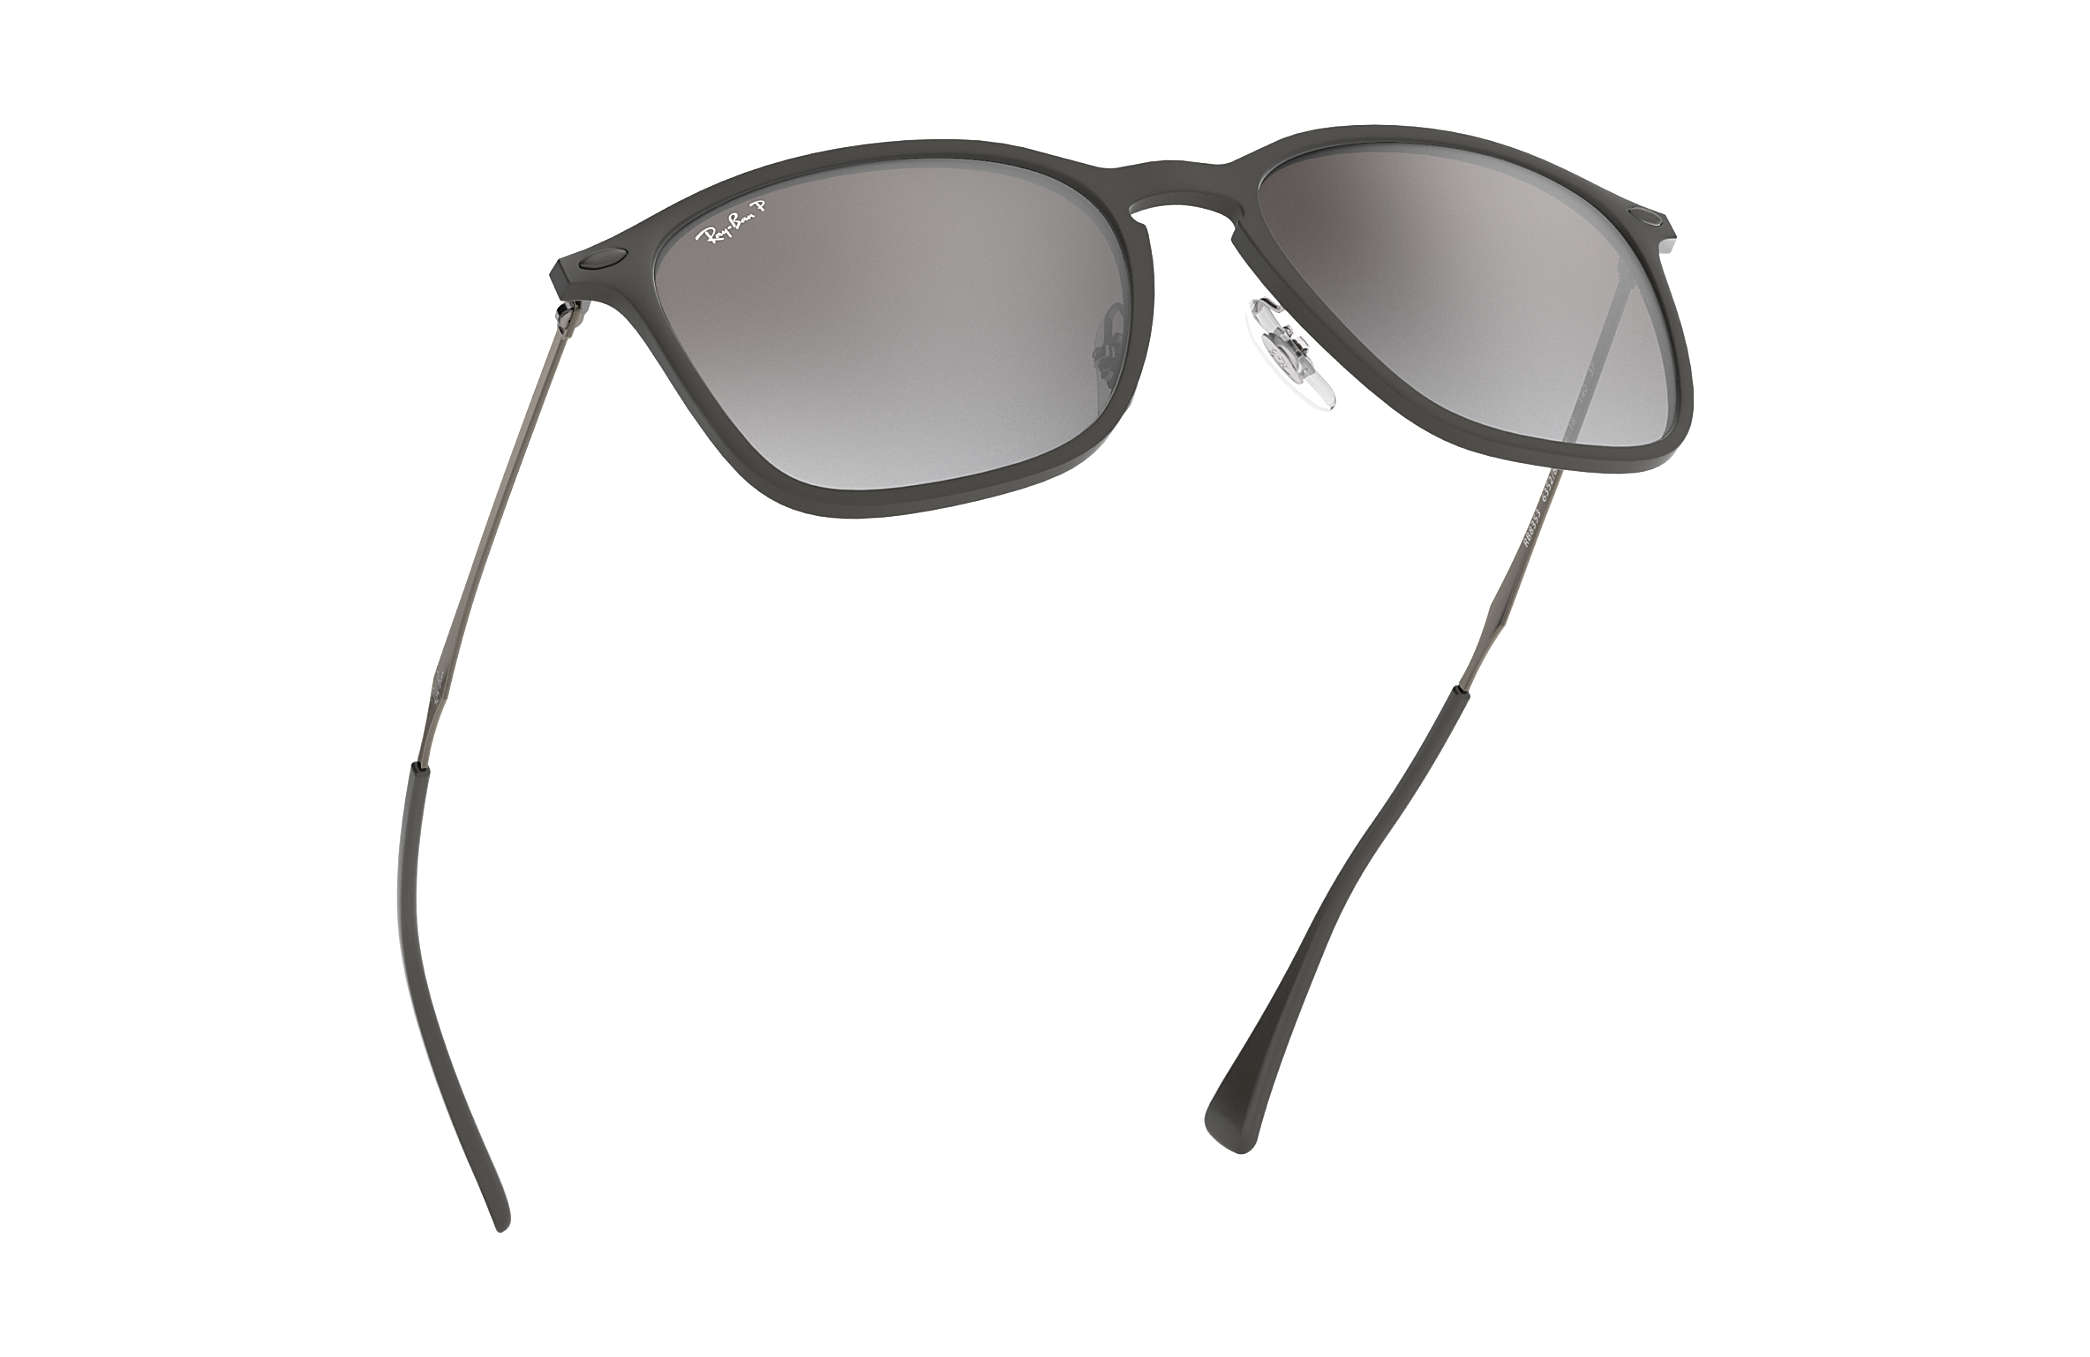 a9afa149a3f Ray-Ban RB8353 Grey - Graphene - Silver Polarized Lenses ...